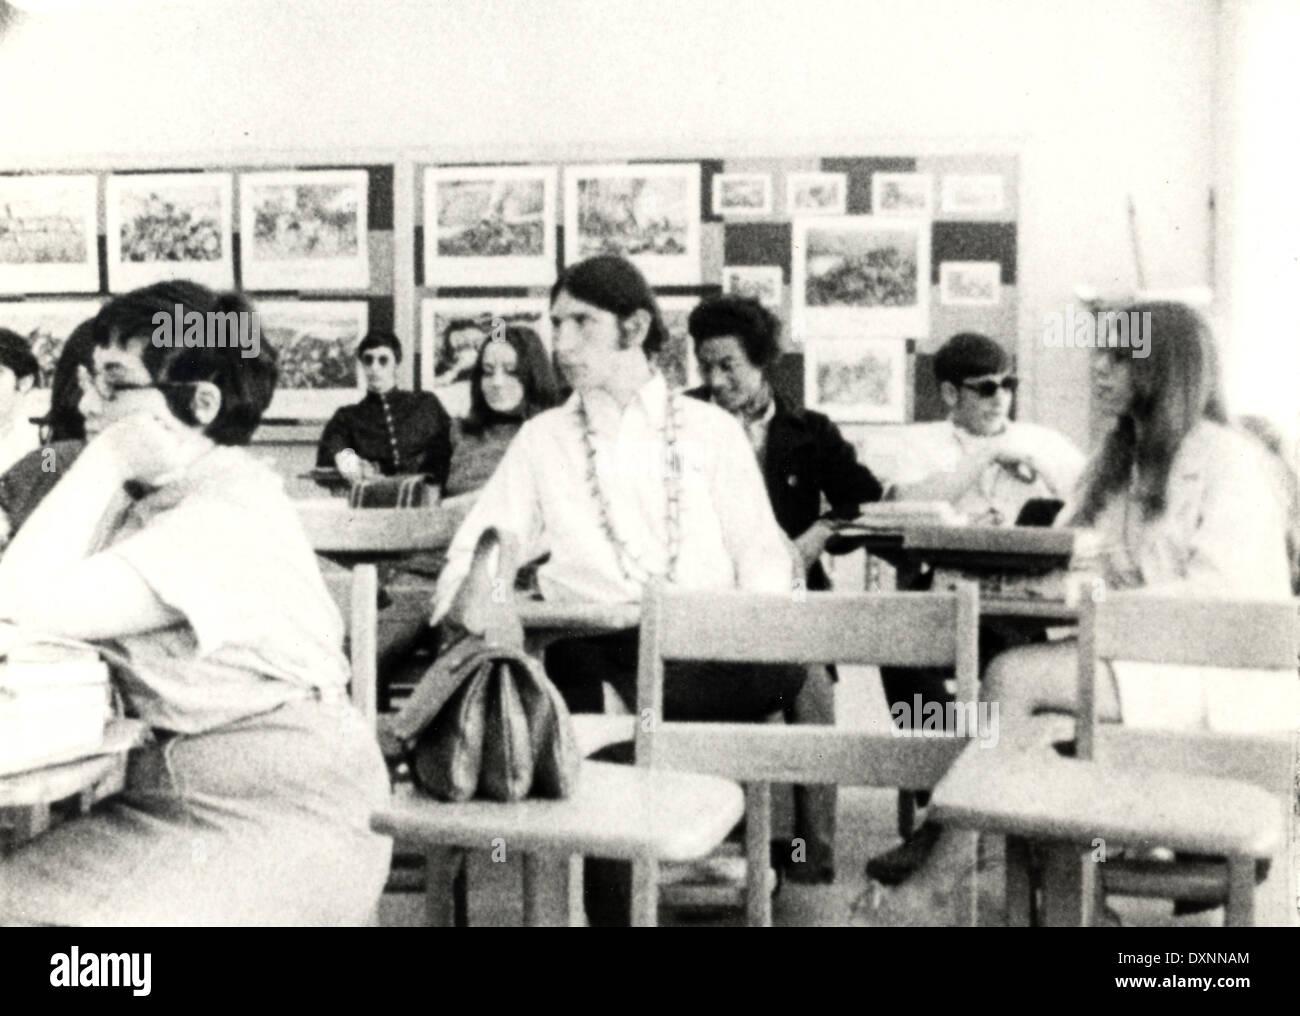 HIGH SCHOOL - Stock Image